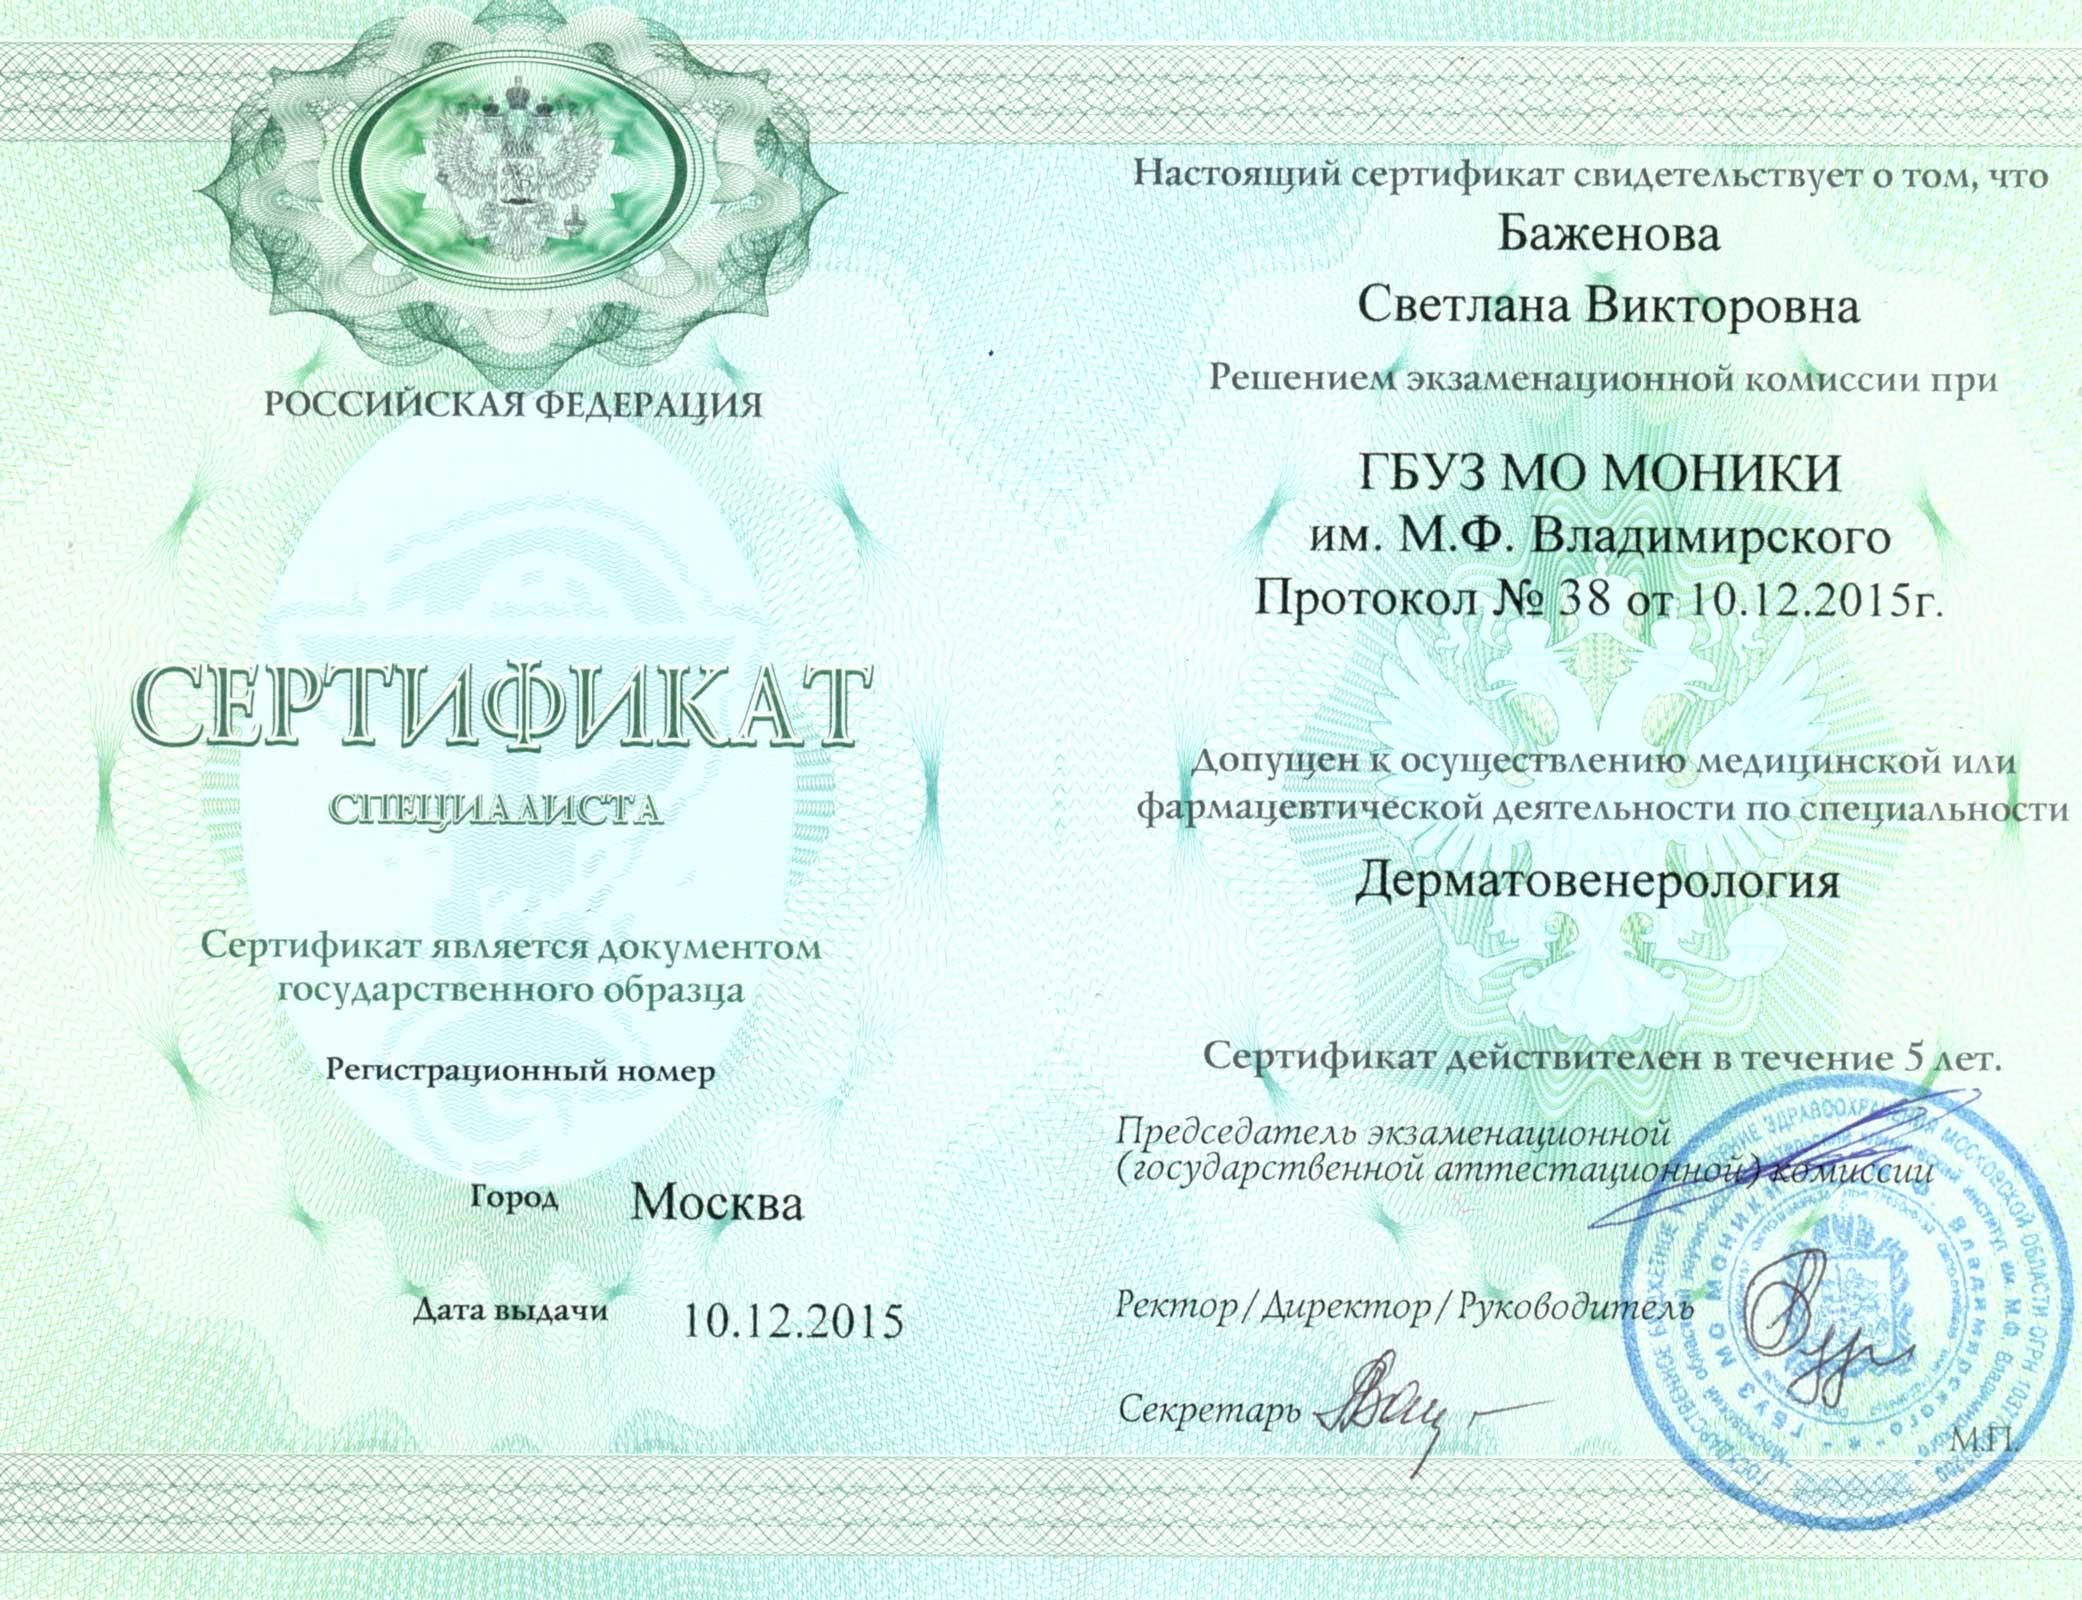 Сертификат специалиста врача-трихолога Баженовой С.В.